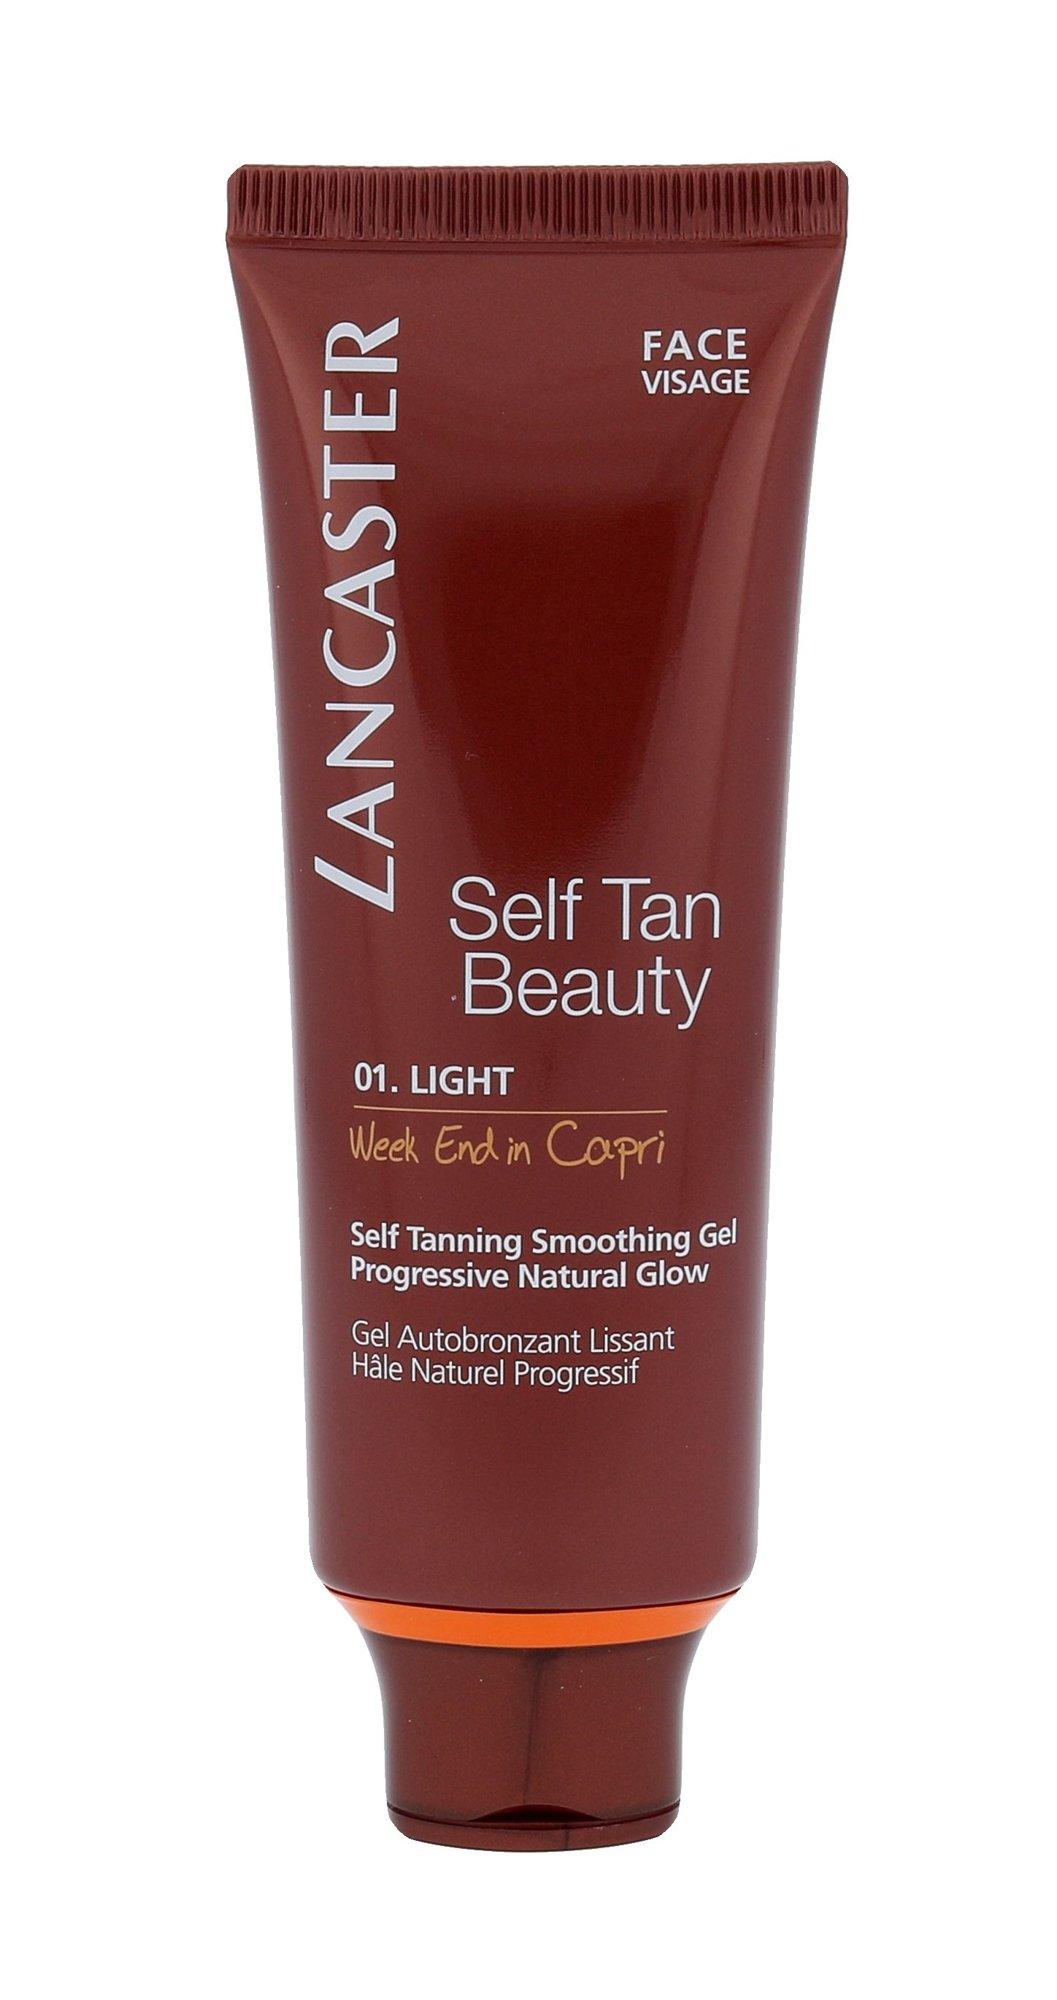 Lancaster Self Tan Beauty Cosmetic 50ml 01 Light - Week End In Capri Self Tanning Smoothing Gel